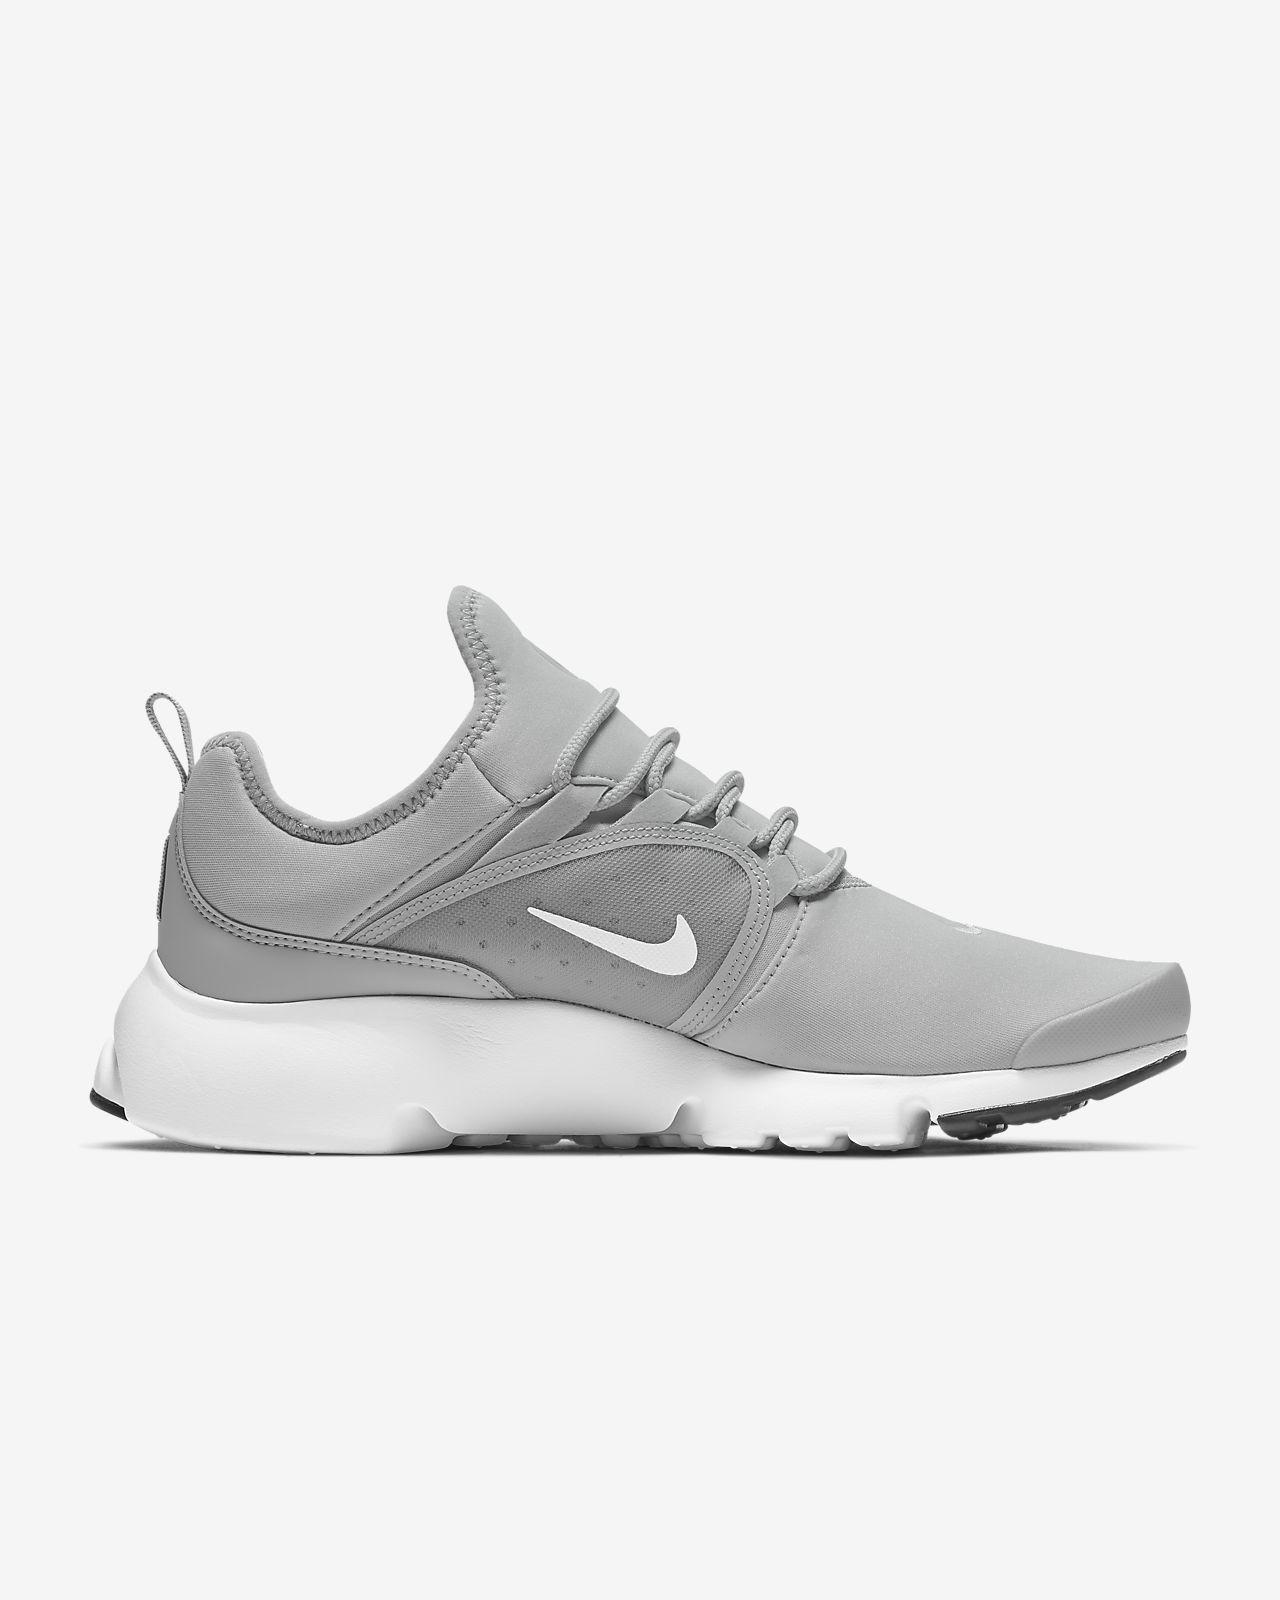 new concept 21cd5 b3bd8 ... Nike Presto Fly World Men s Shoe